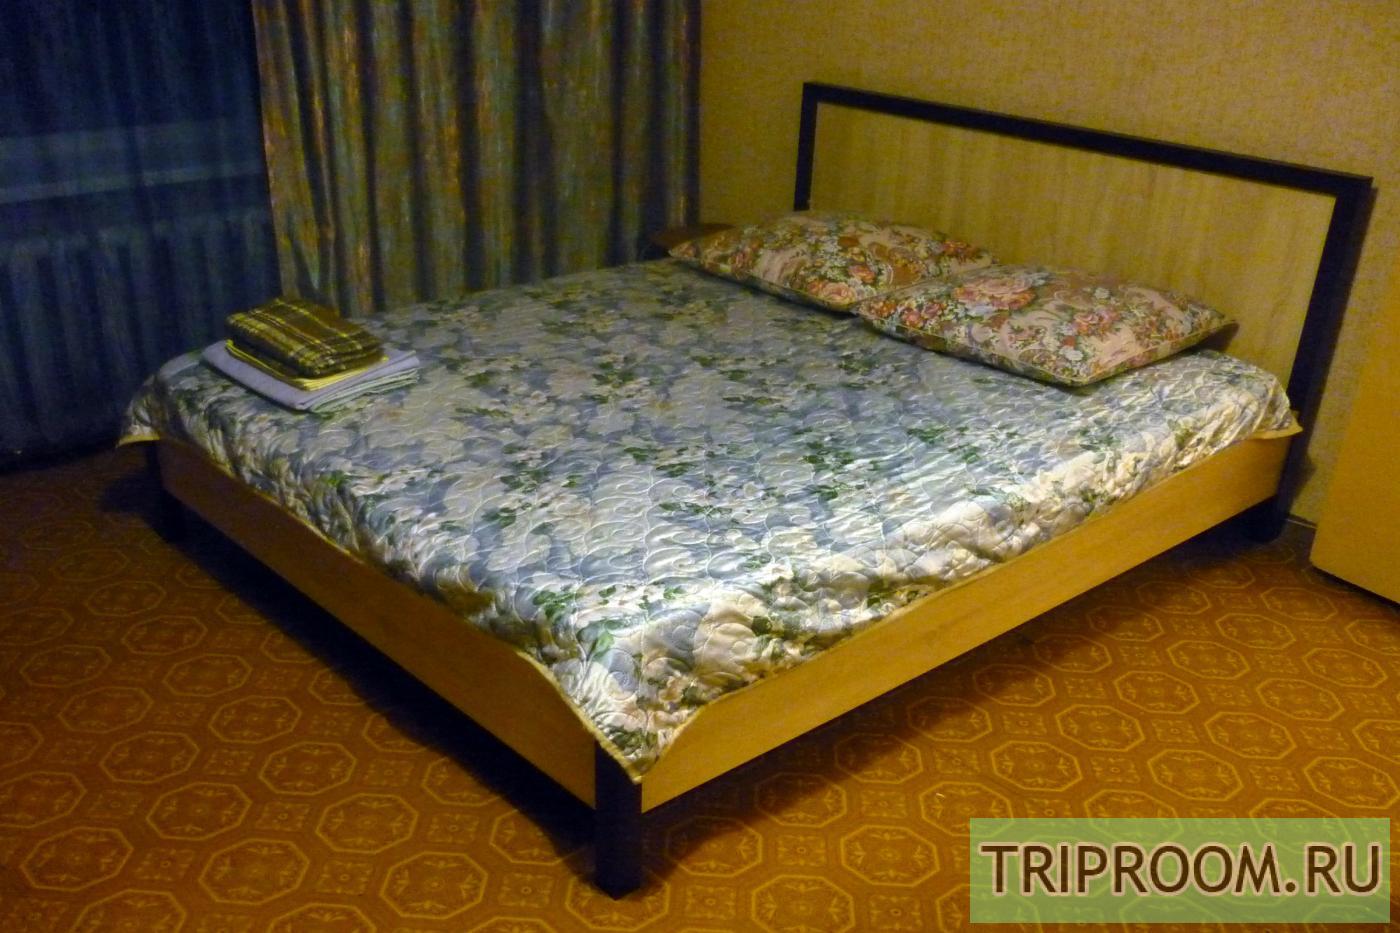 1-комнатная квартира посуточно (вариант № 671), ул. Ленинский проспект, фото № 5